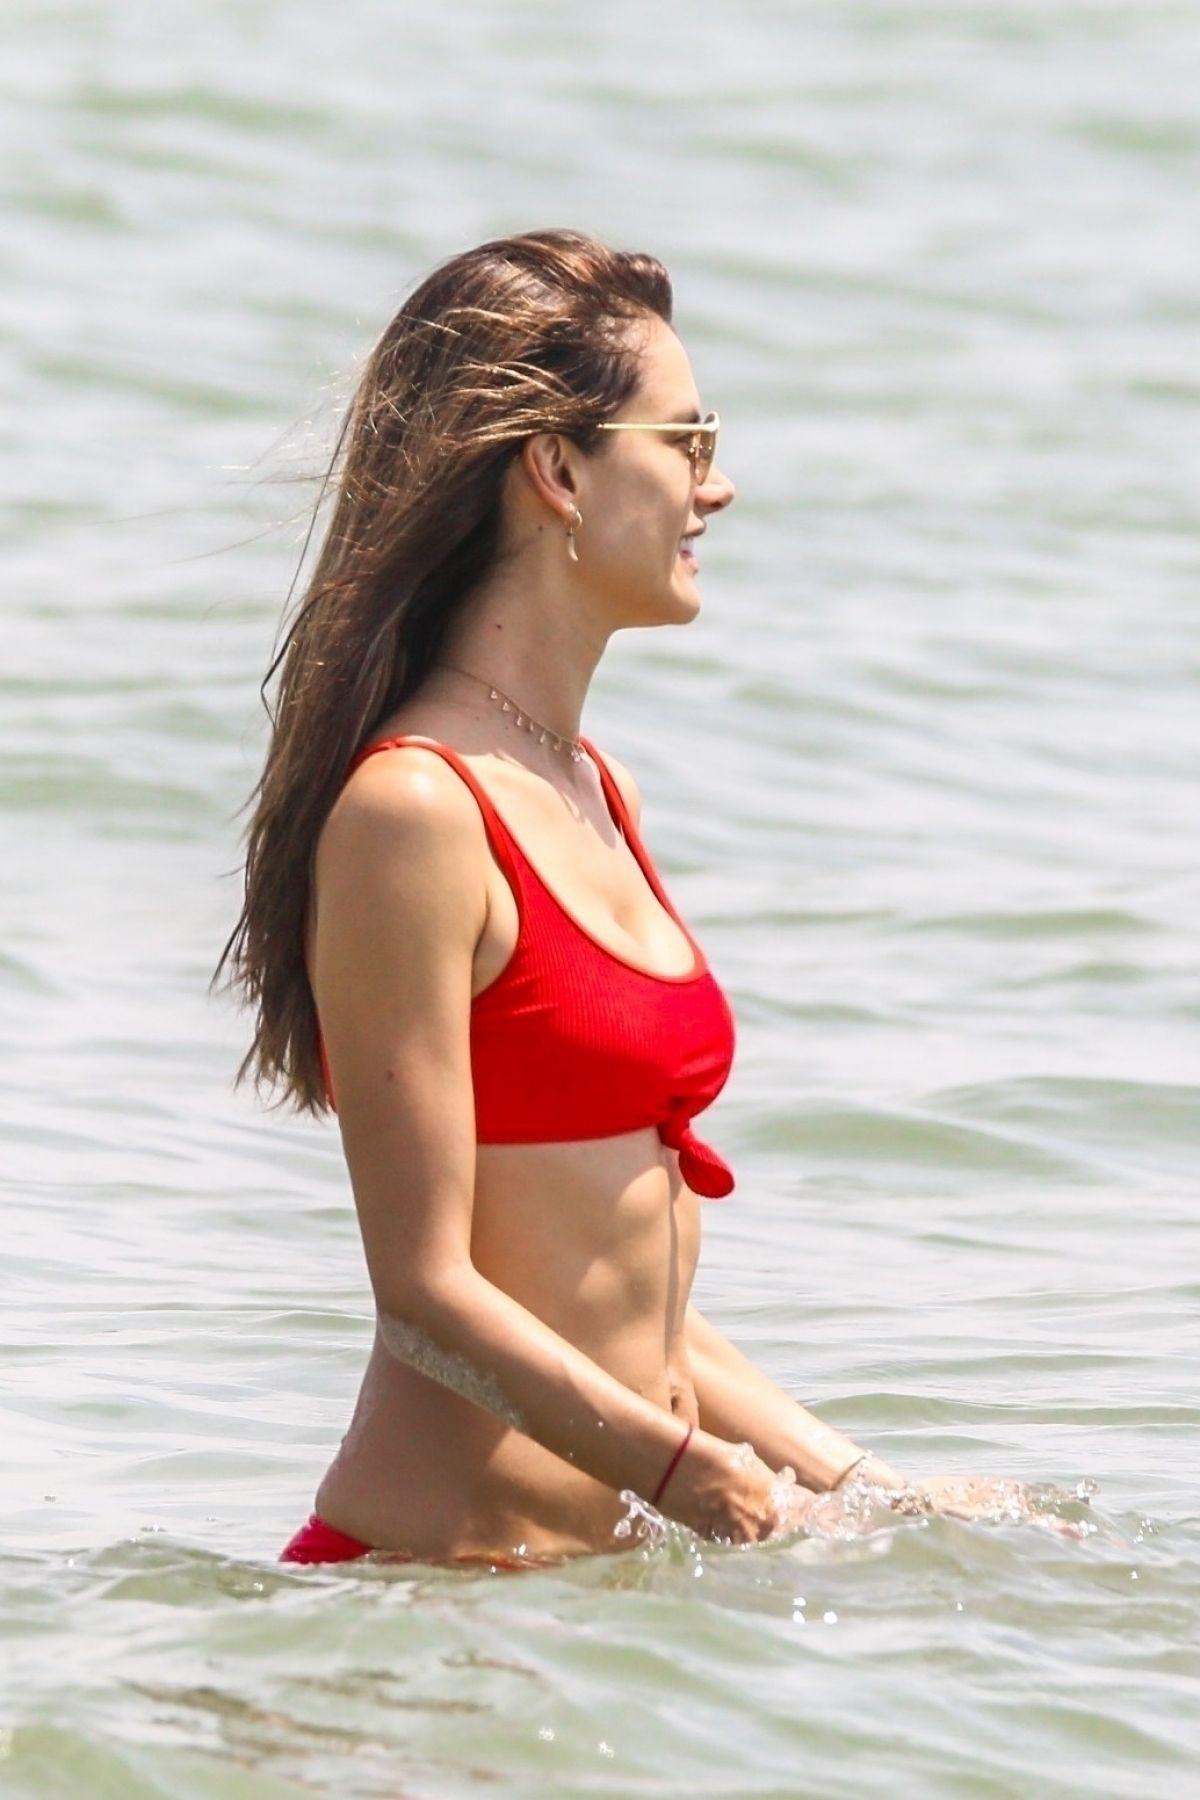 Alessandra Ambrosio in Red Bikini on the beach in Florianopolis Pic 8 of 35